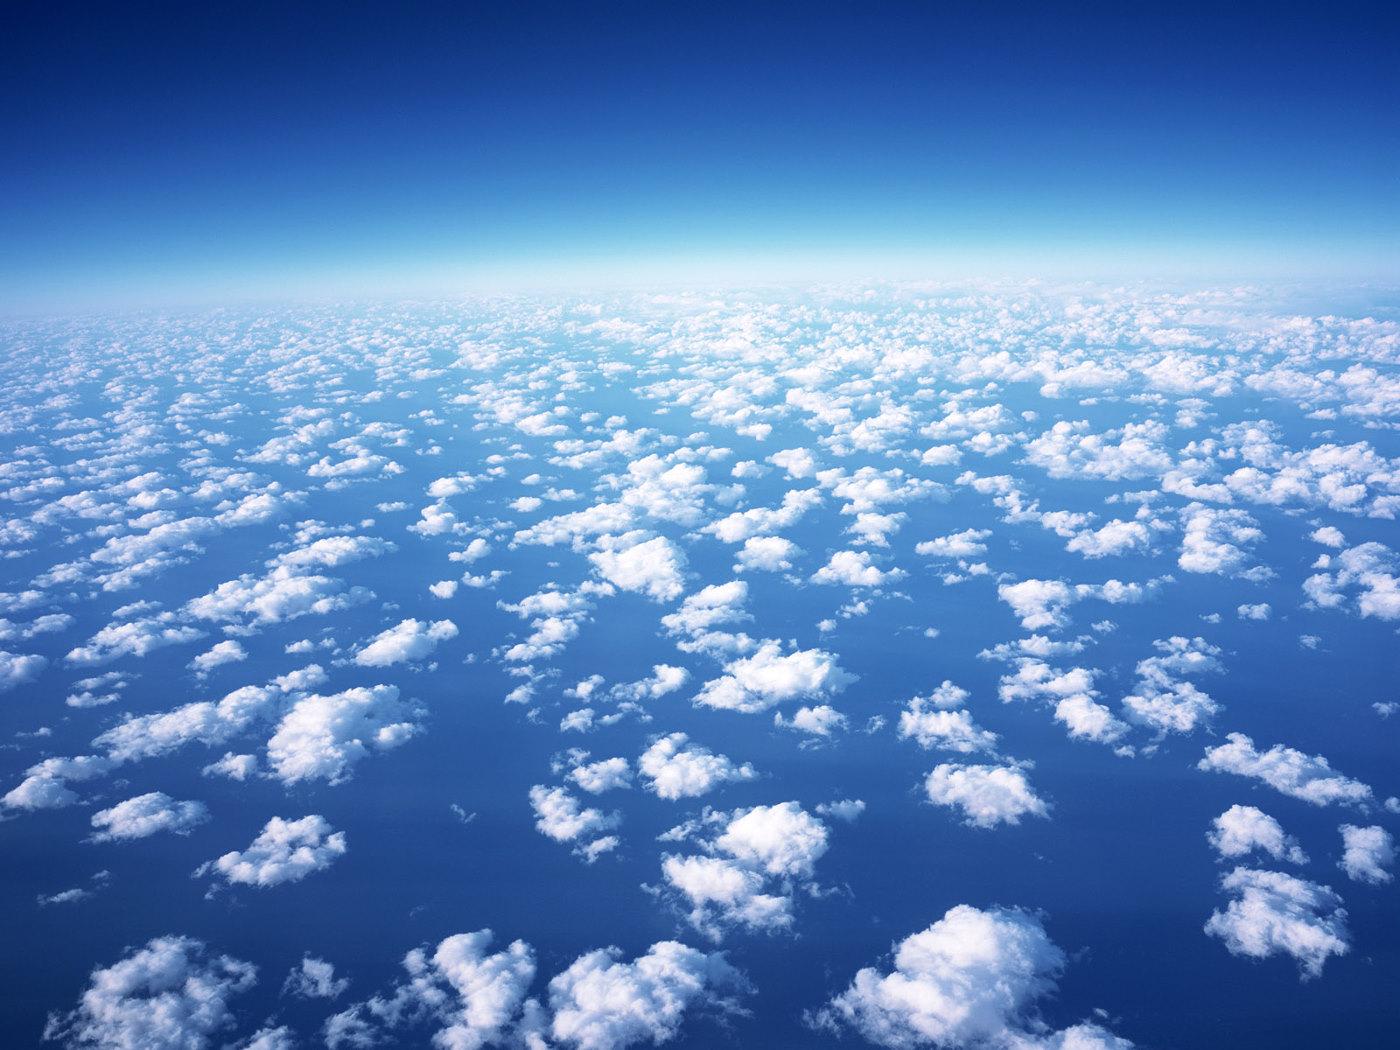 Cloud Wallpapers 1400x1050